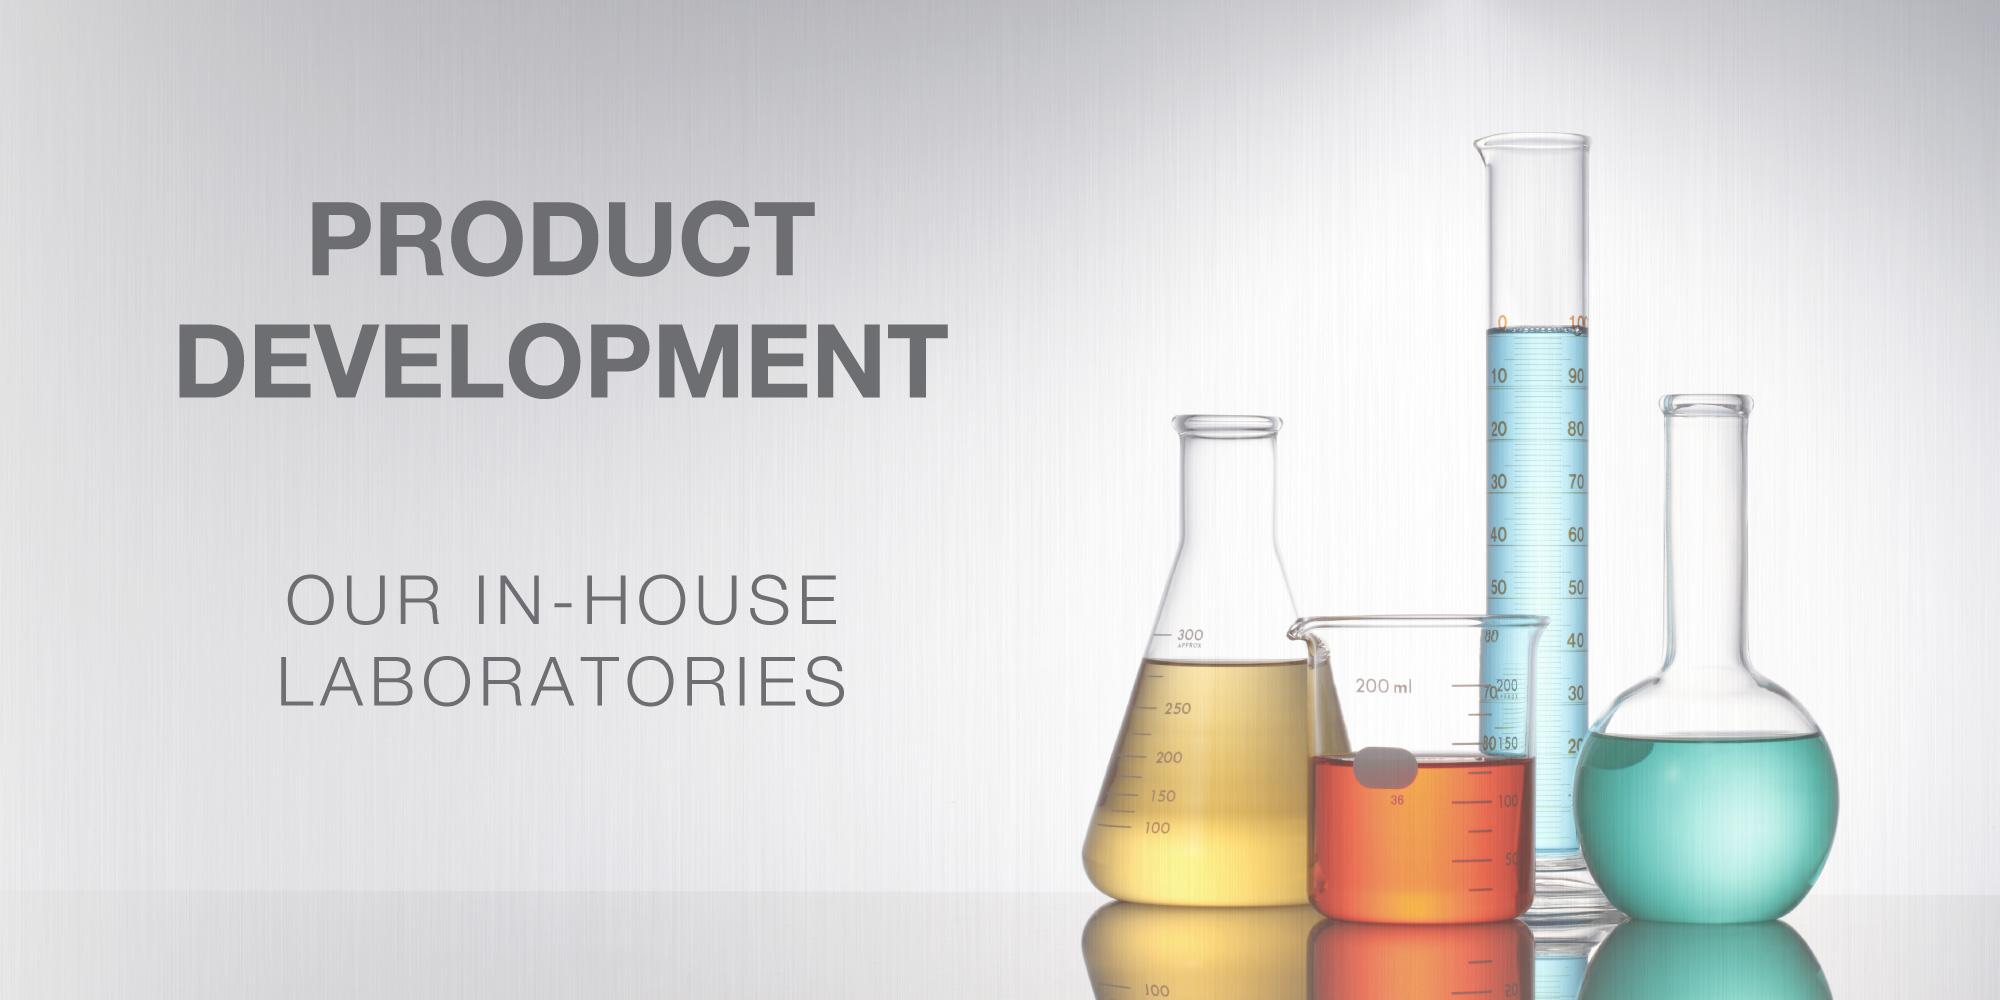 en-product-development